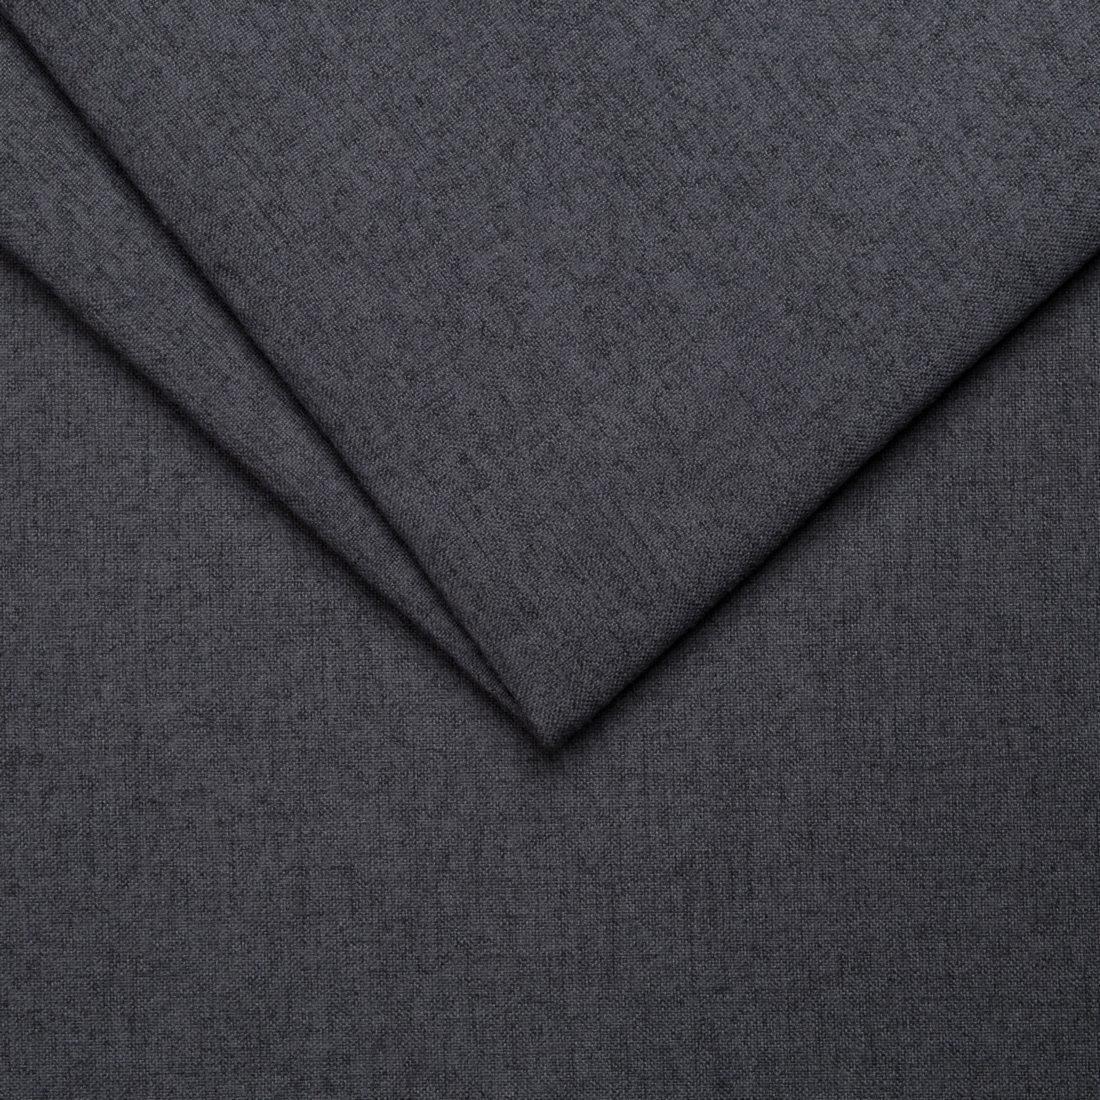 Меблева тканина Cashmere 21 Graphite, рогожка